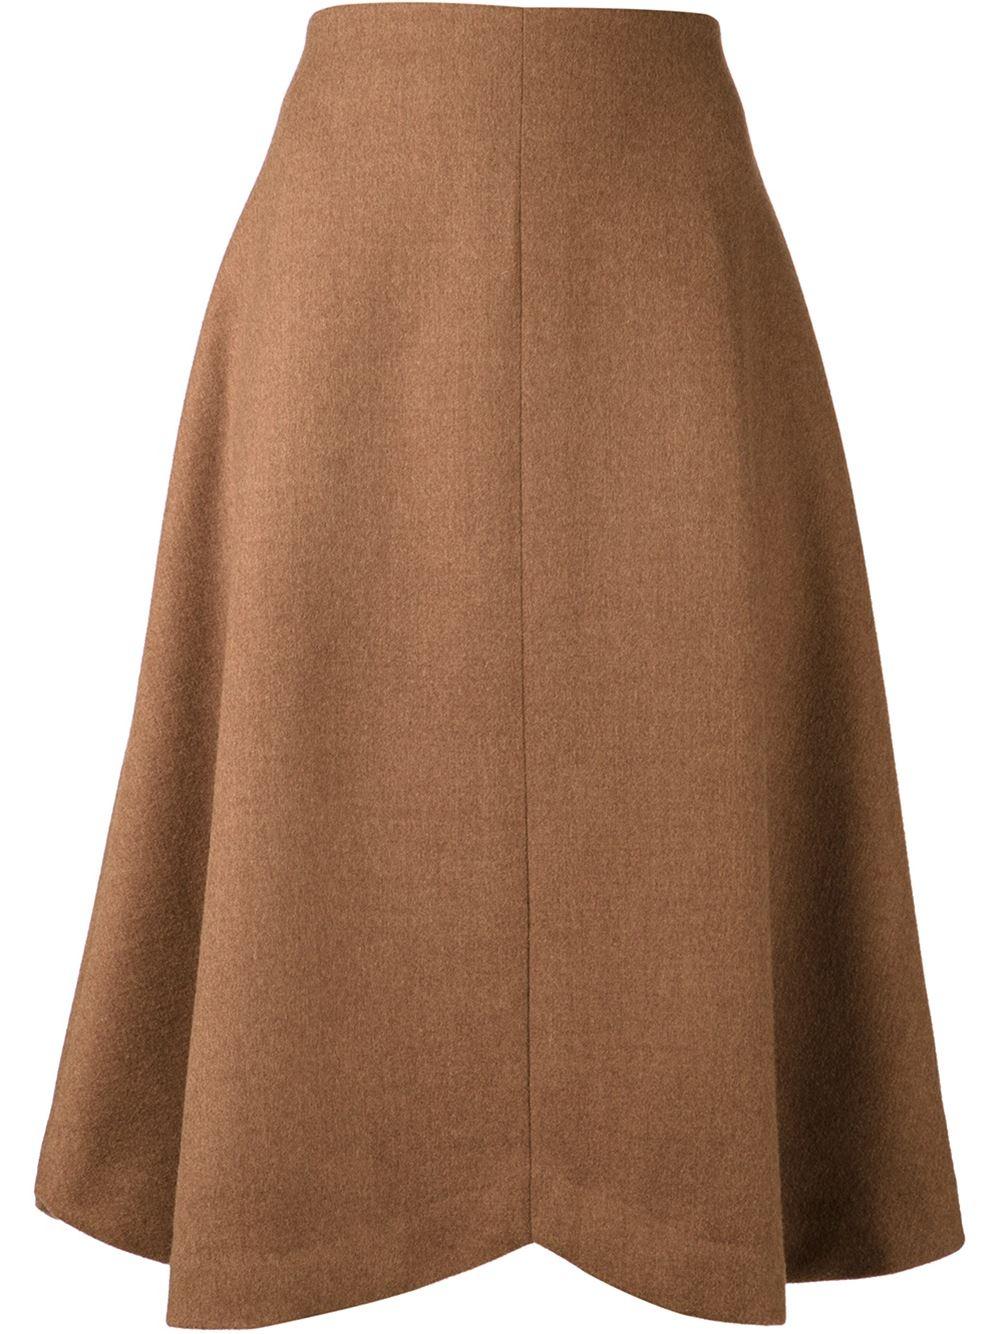 rodarte a line skirt in brown lyst